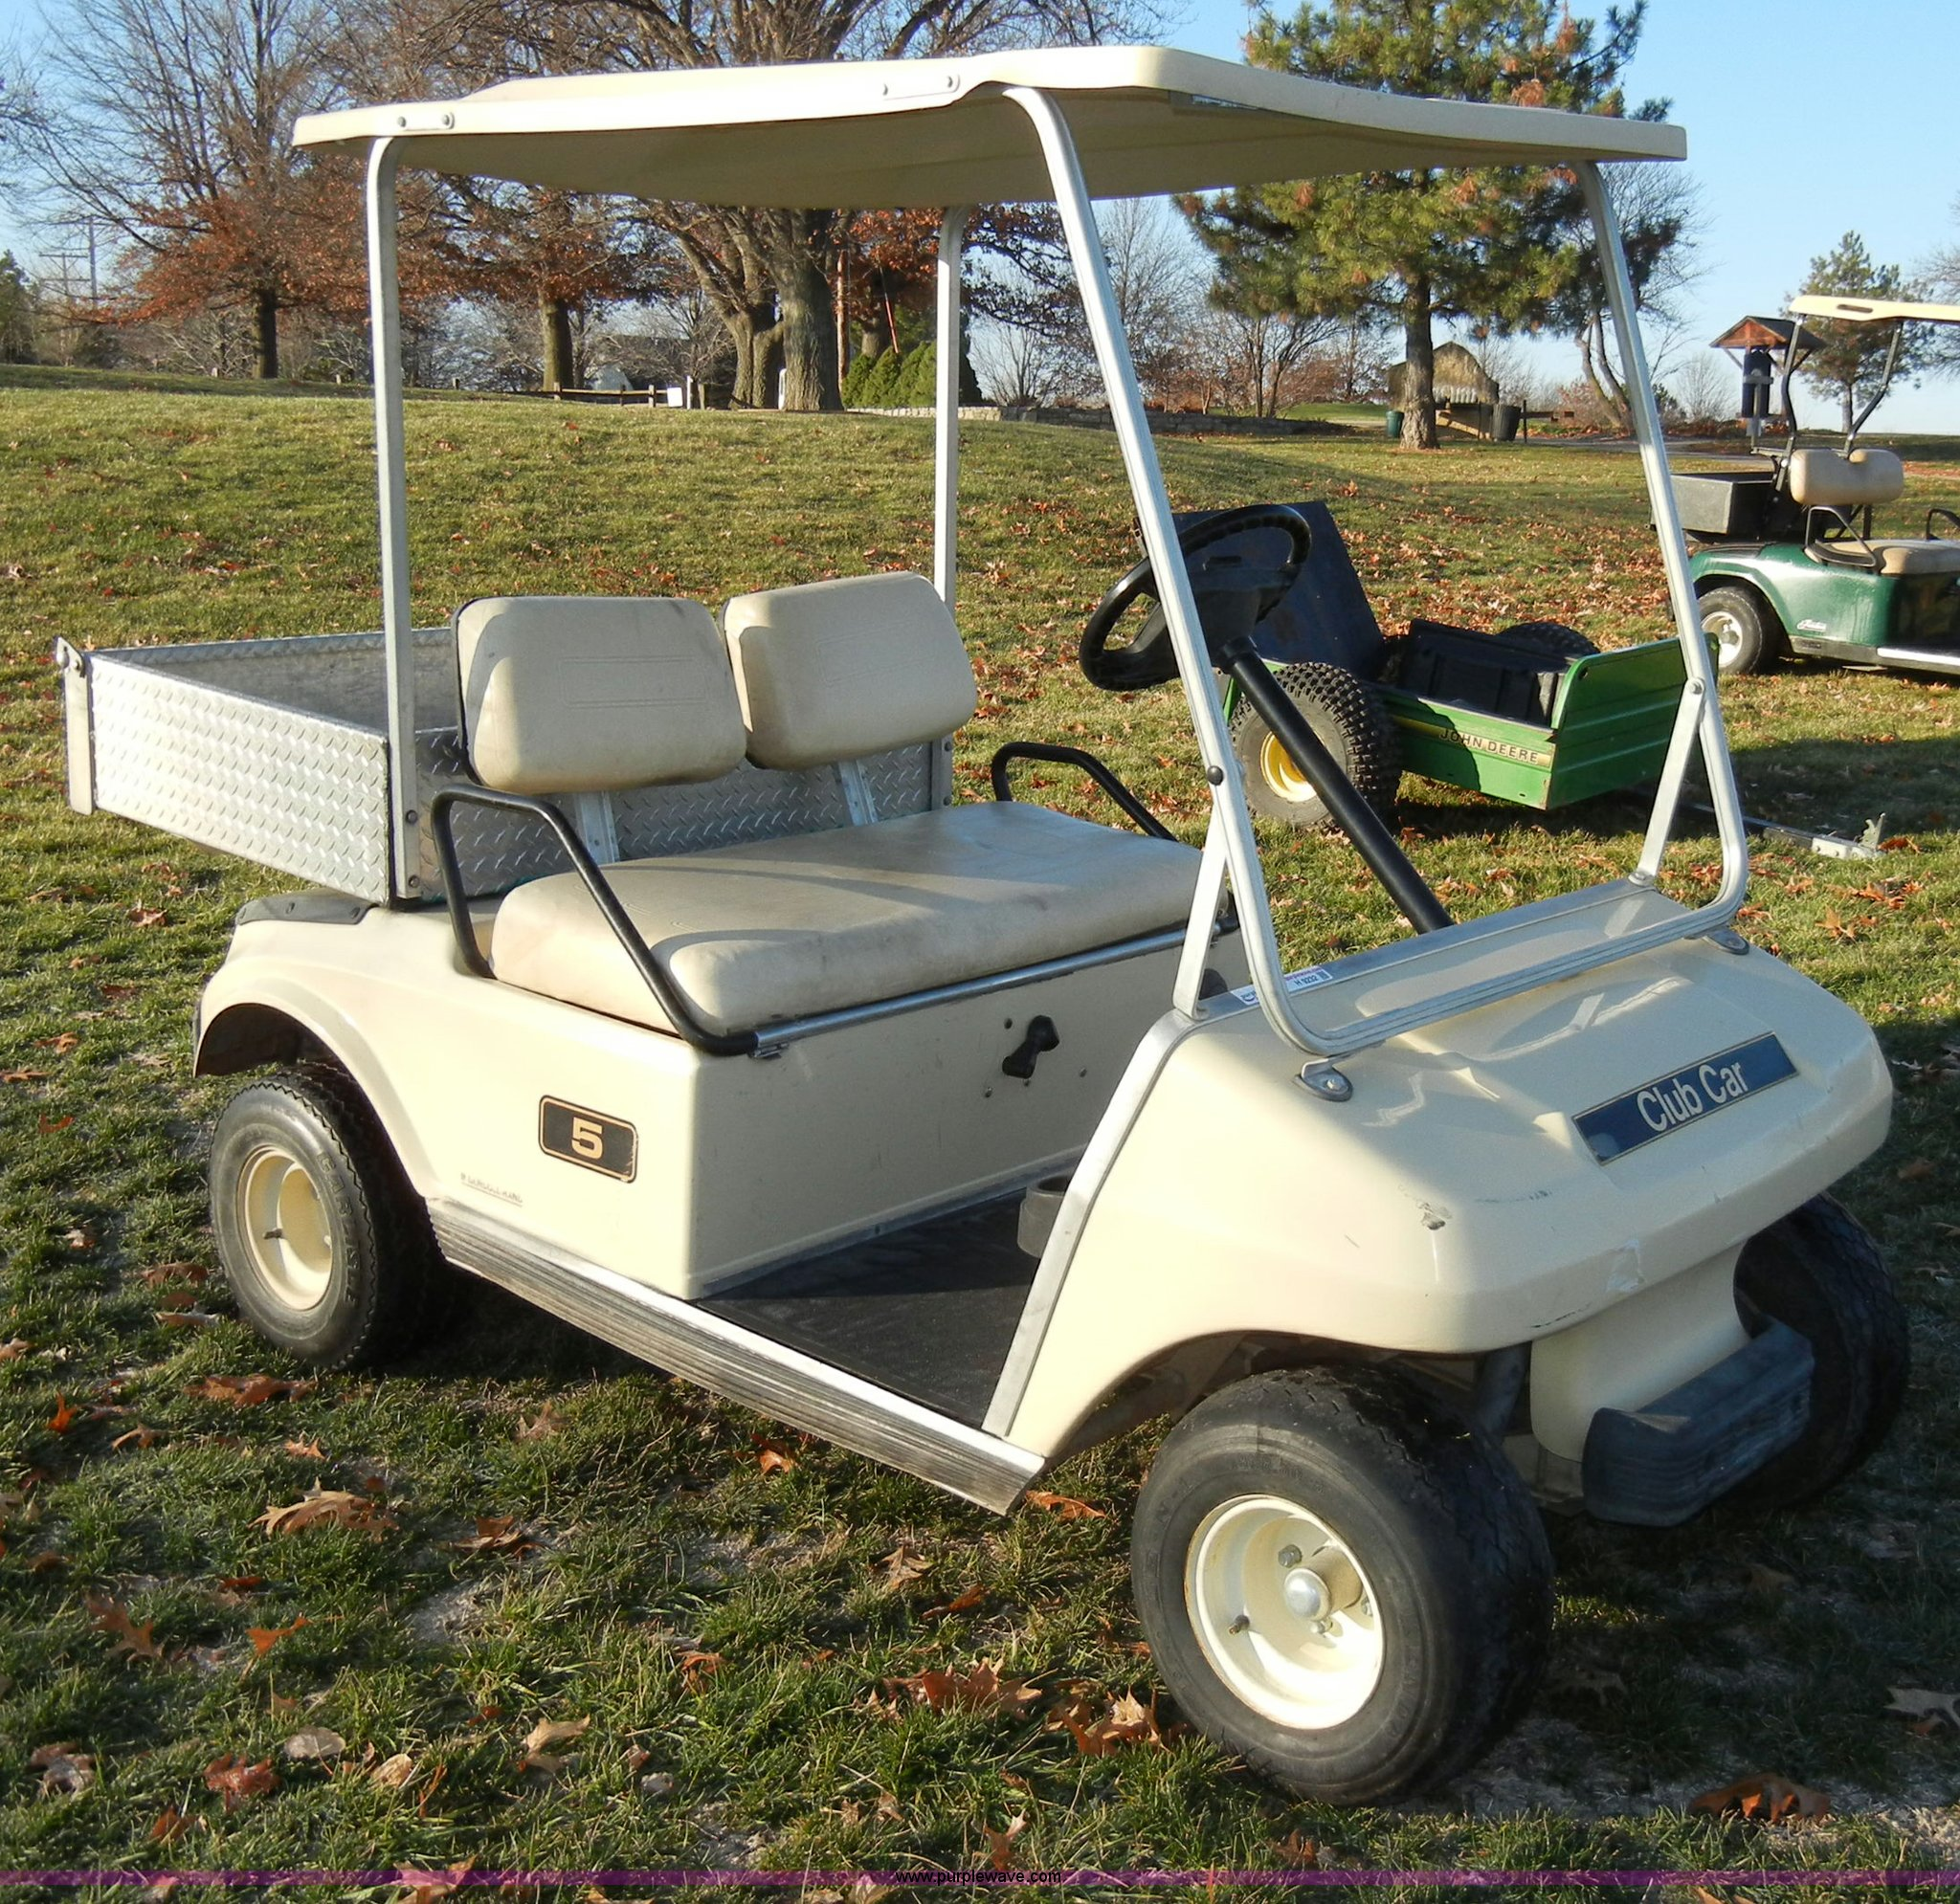 Pin By Abhijay Janu On Homes: Ingersoll Rand Club Car Golf Cart